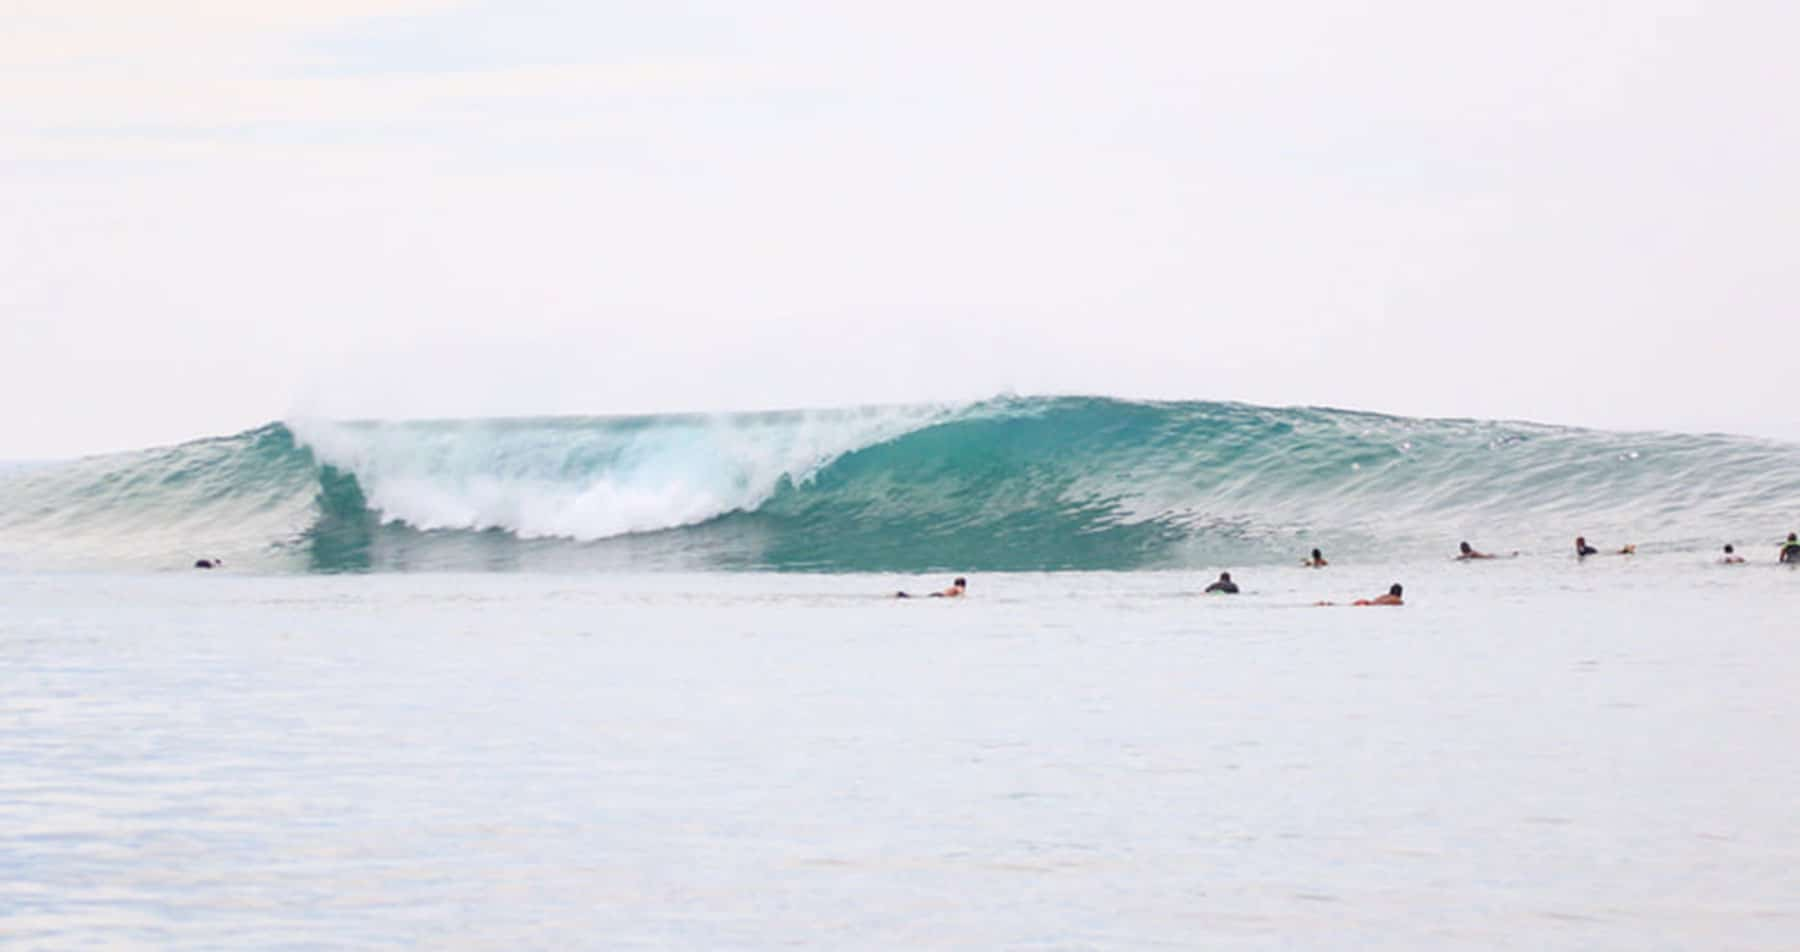 mentawai surf camp the shadow mentawai islands surfing indonesia